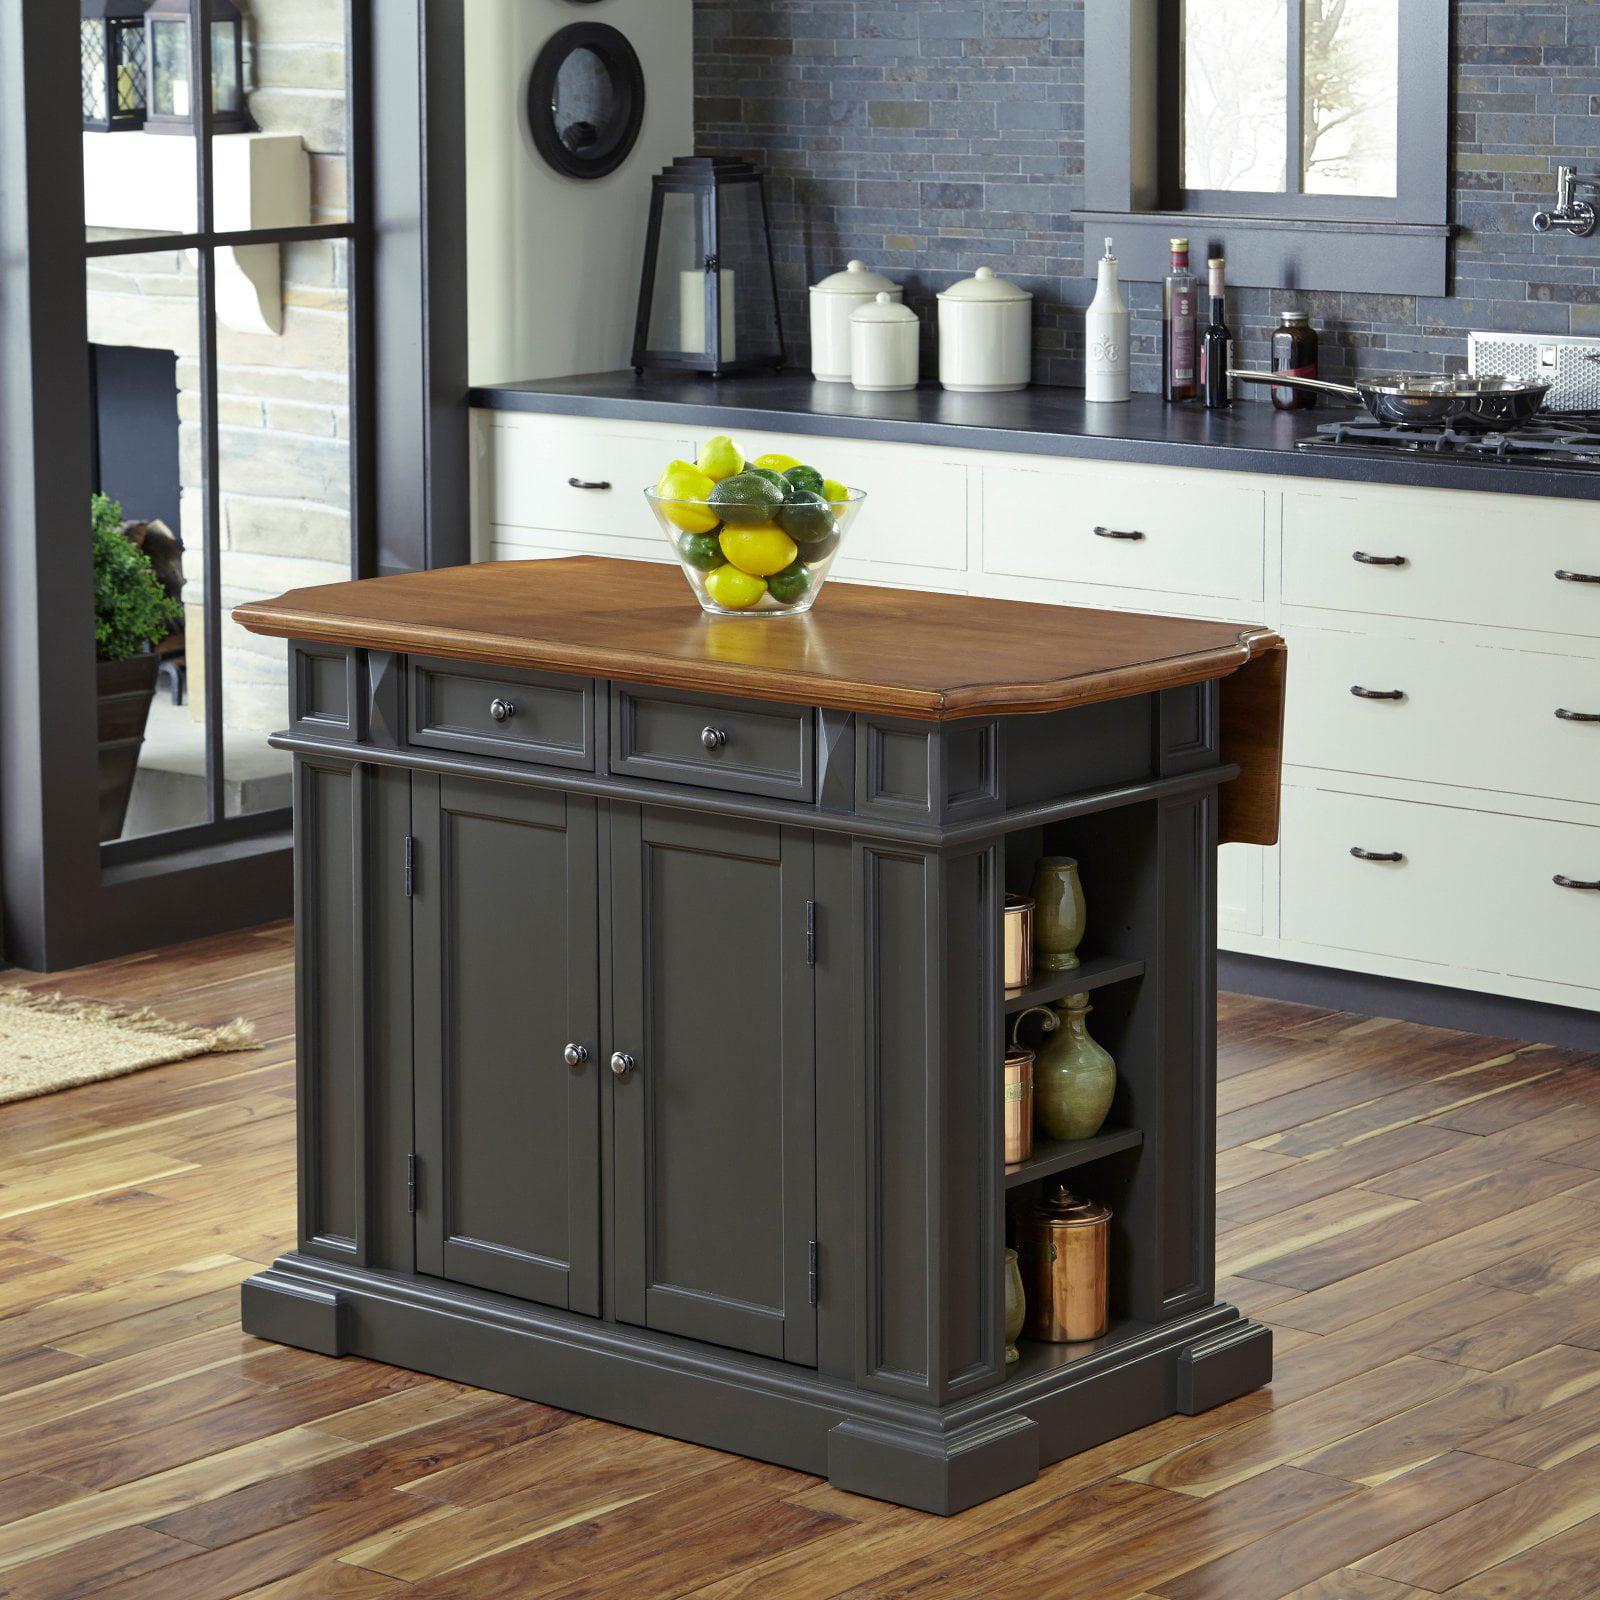 Home Styles Americana Kitchen Island - Gray